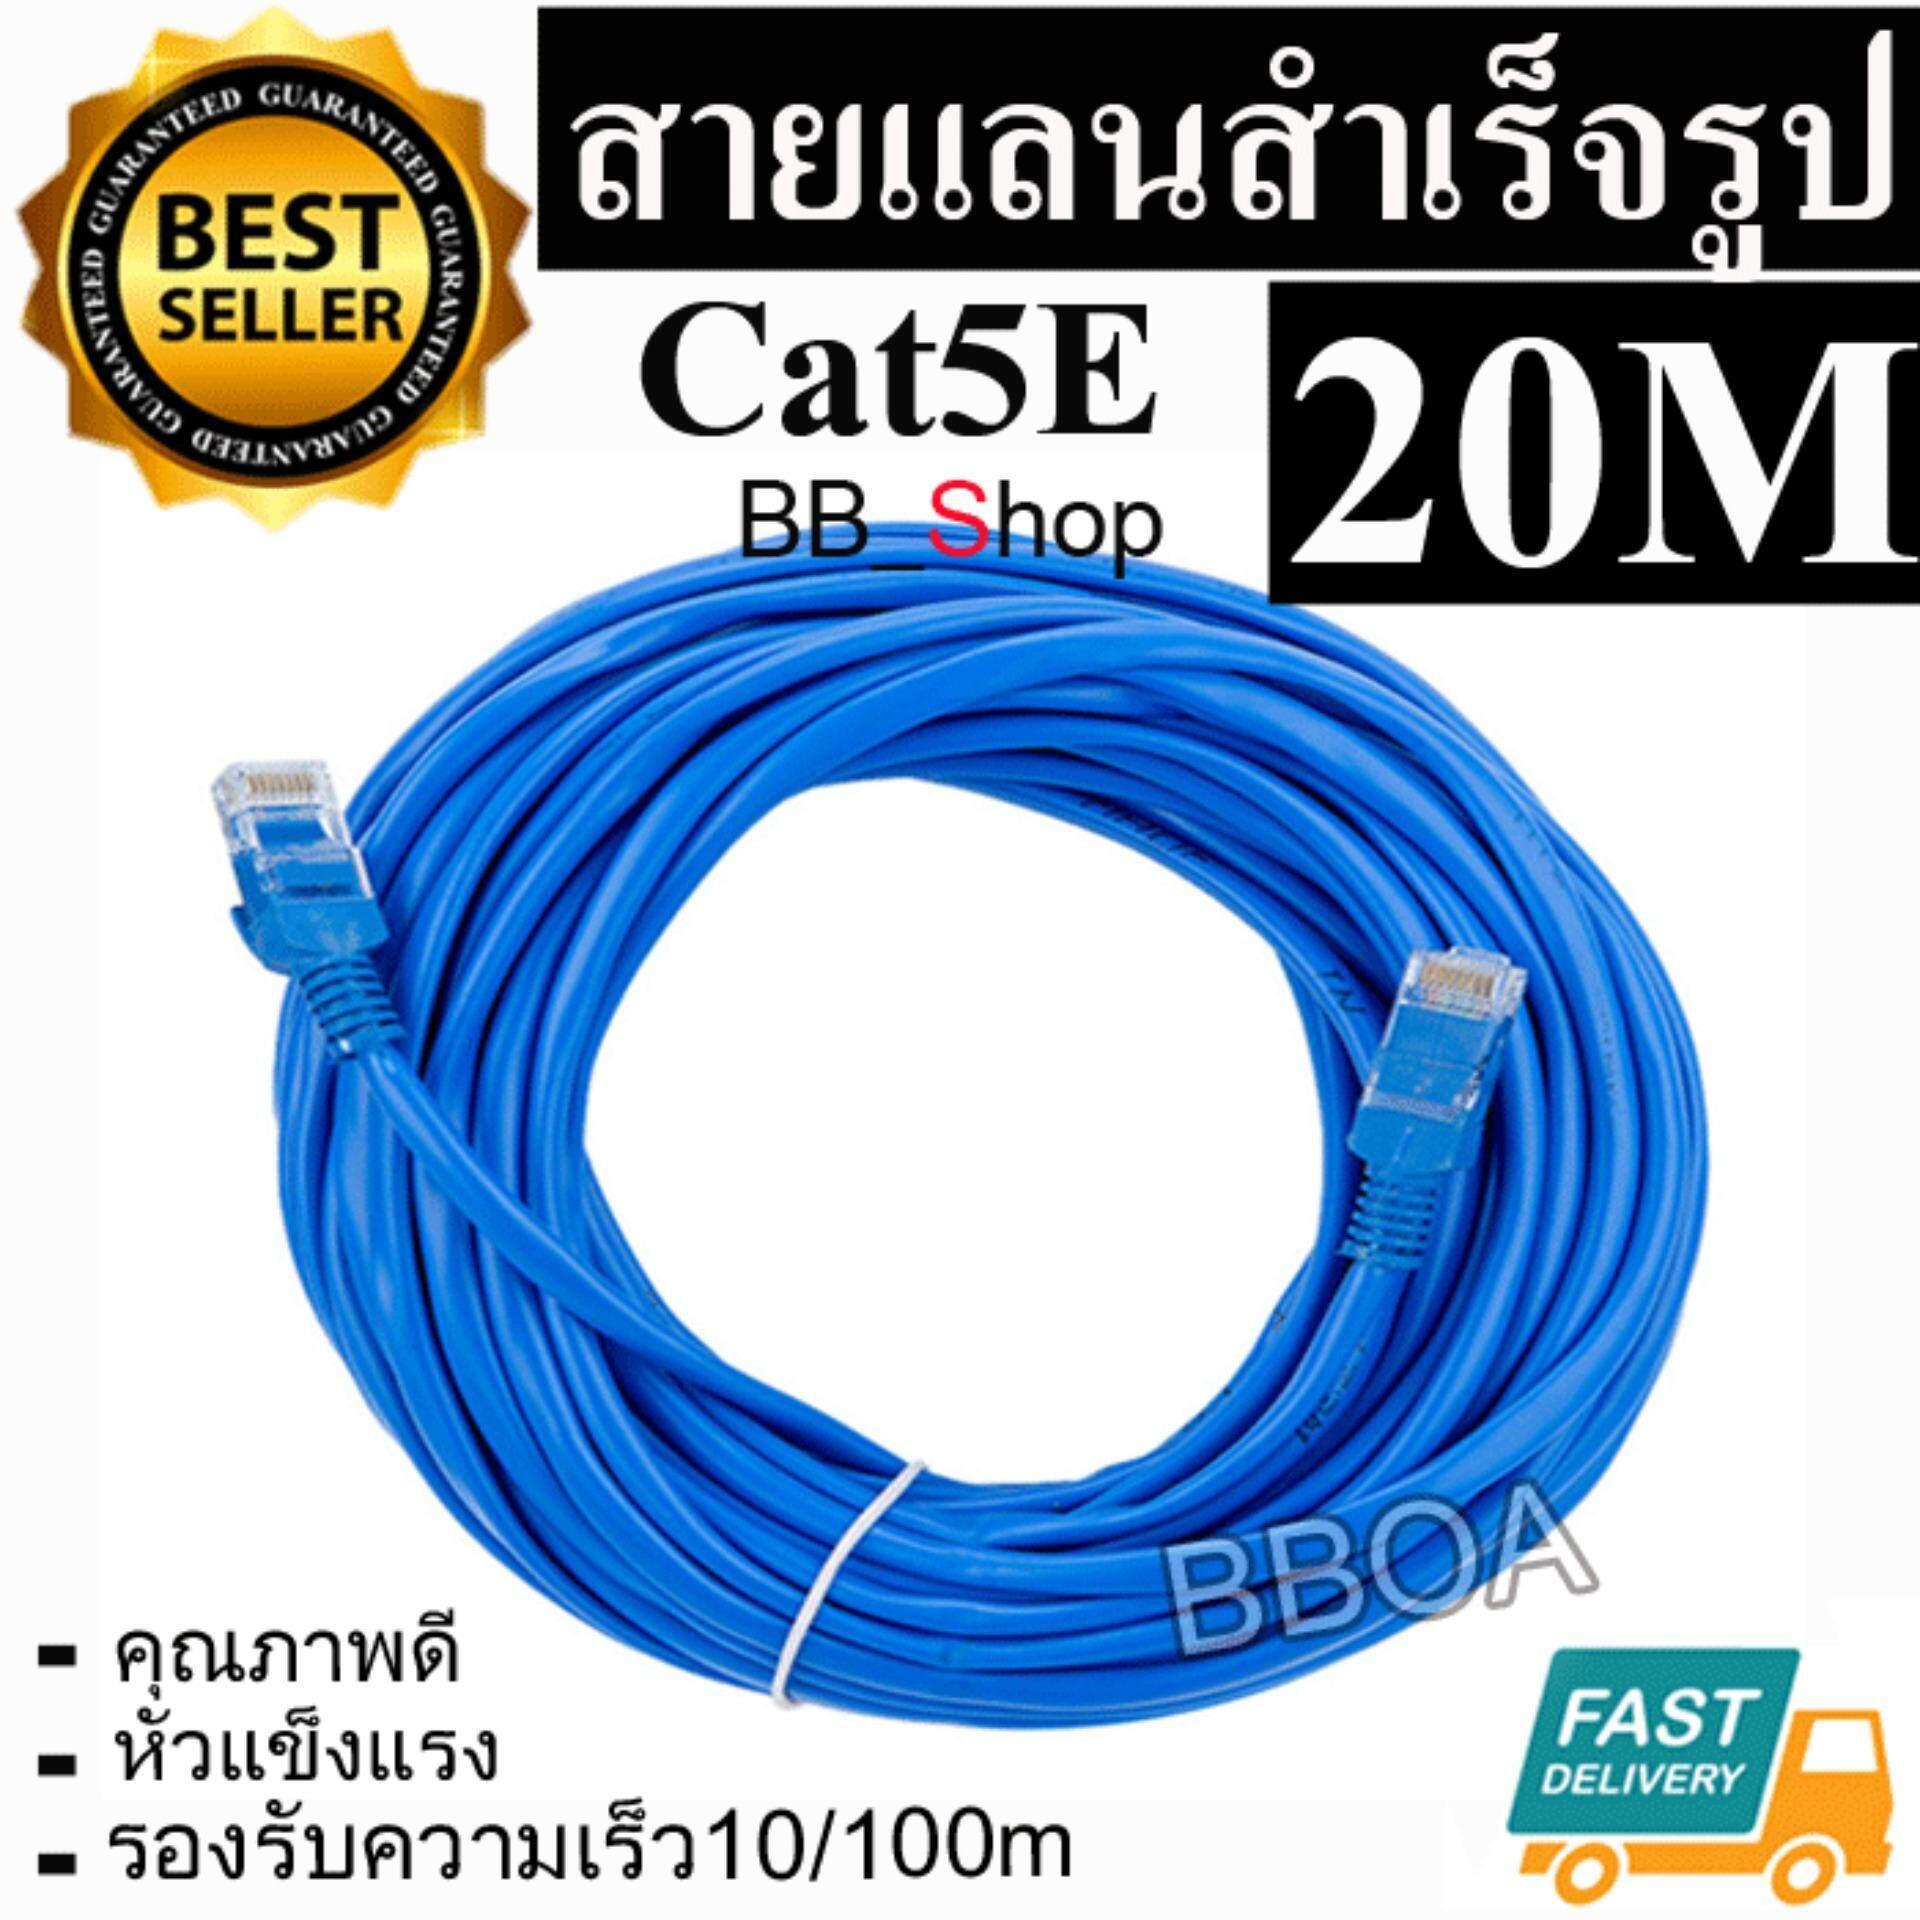 Bb Link Cable Lan Cat5e 20m สายแลน เข้าหัวสำเร็จรูป 20เมตร (สีน้ำเงิน).